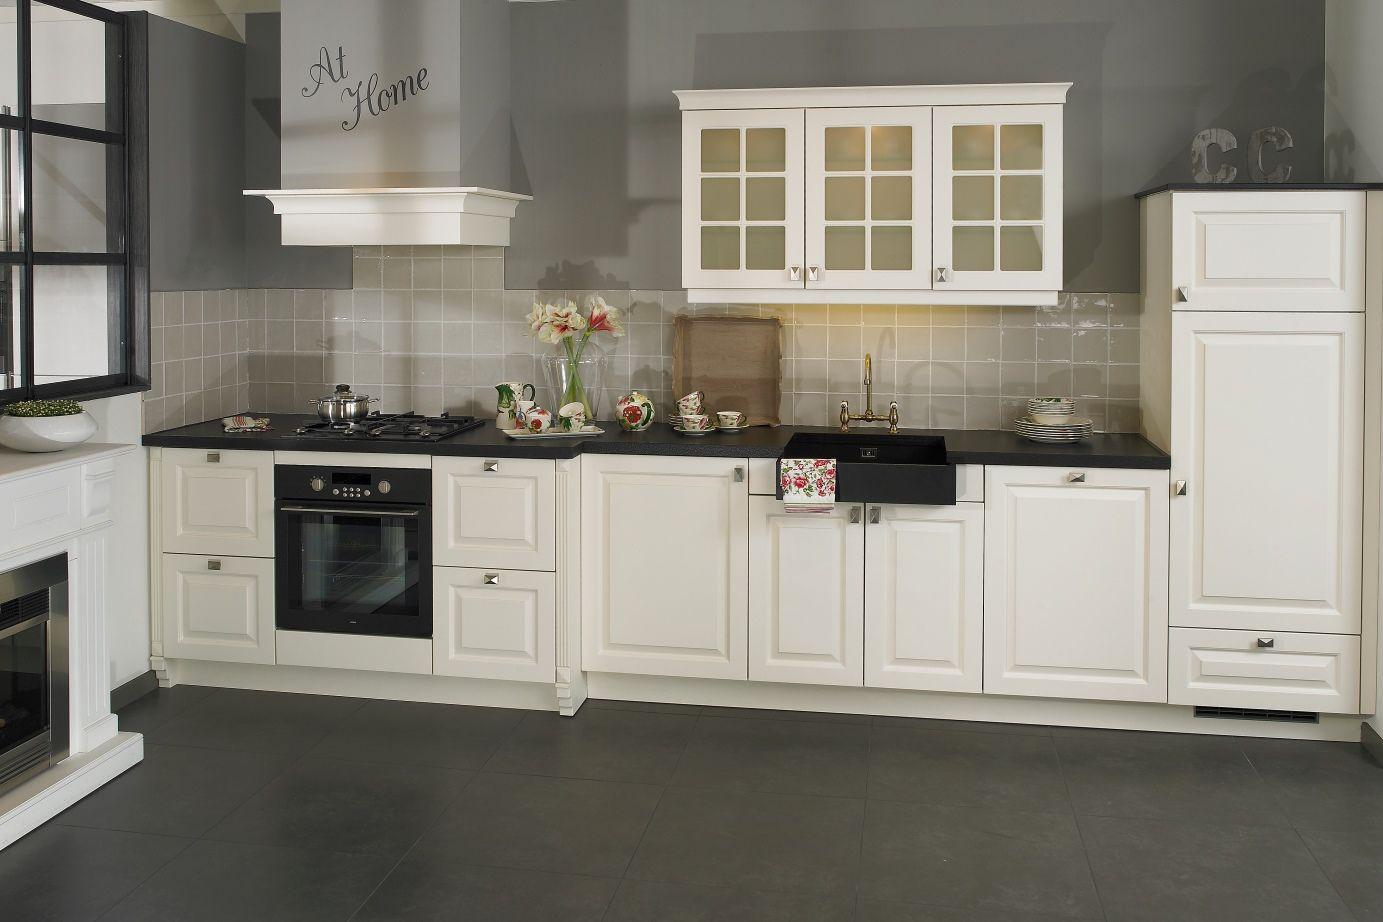 Farmhouse Keuken Landelijk : Ikea keuken ontwerp landelijk keukens kitchen